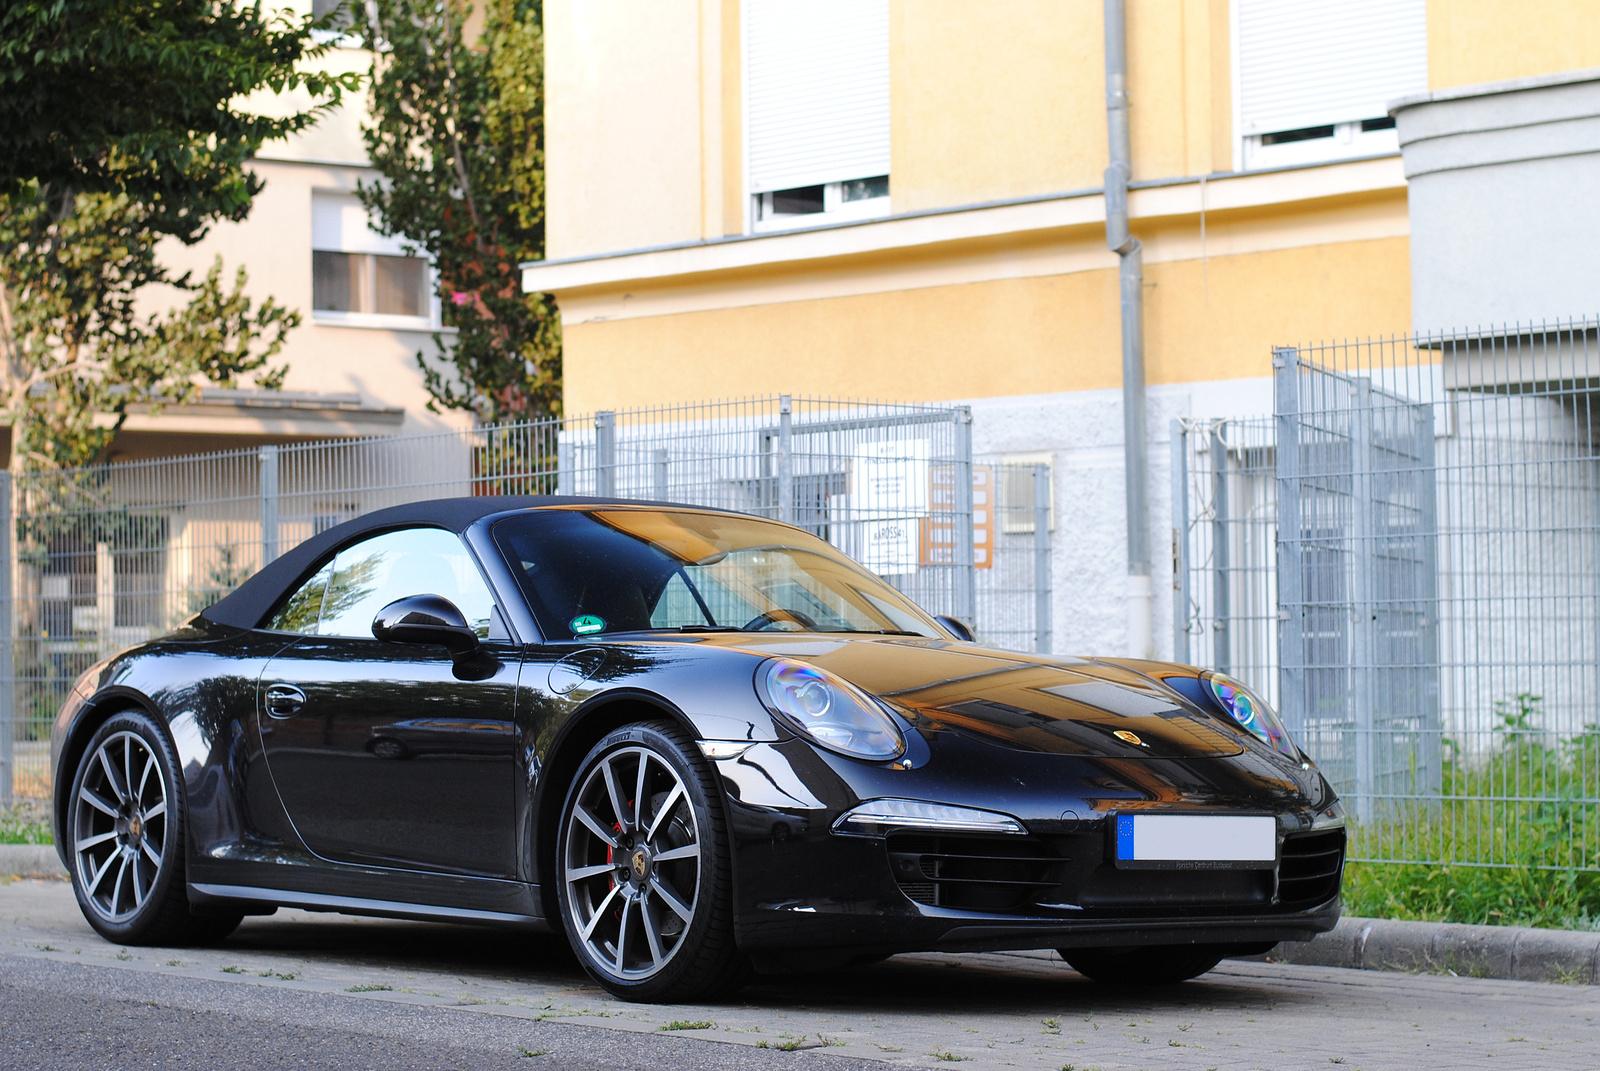 Porsche 911 (991) Carrera 4S Cabriolet